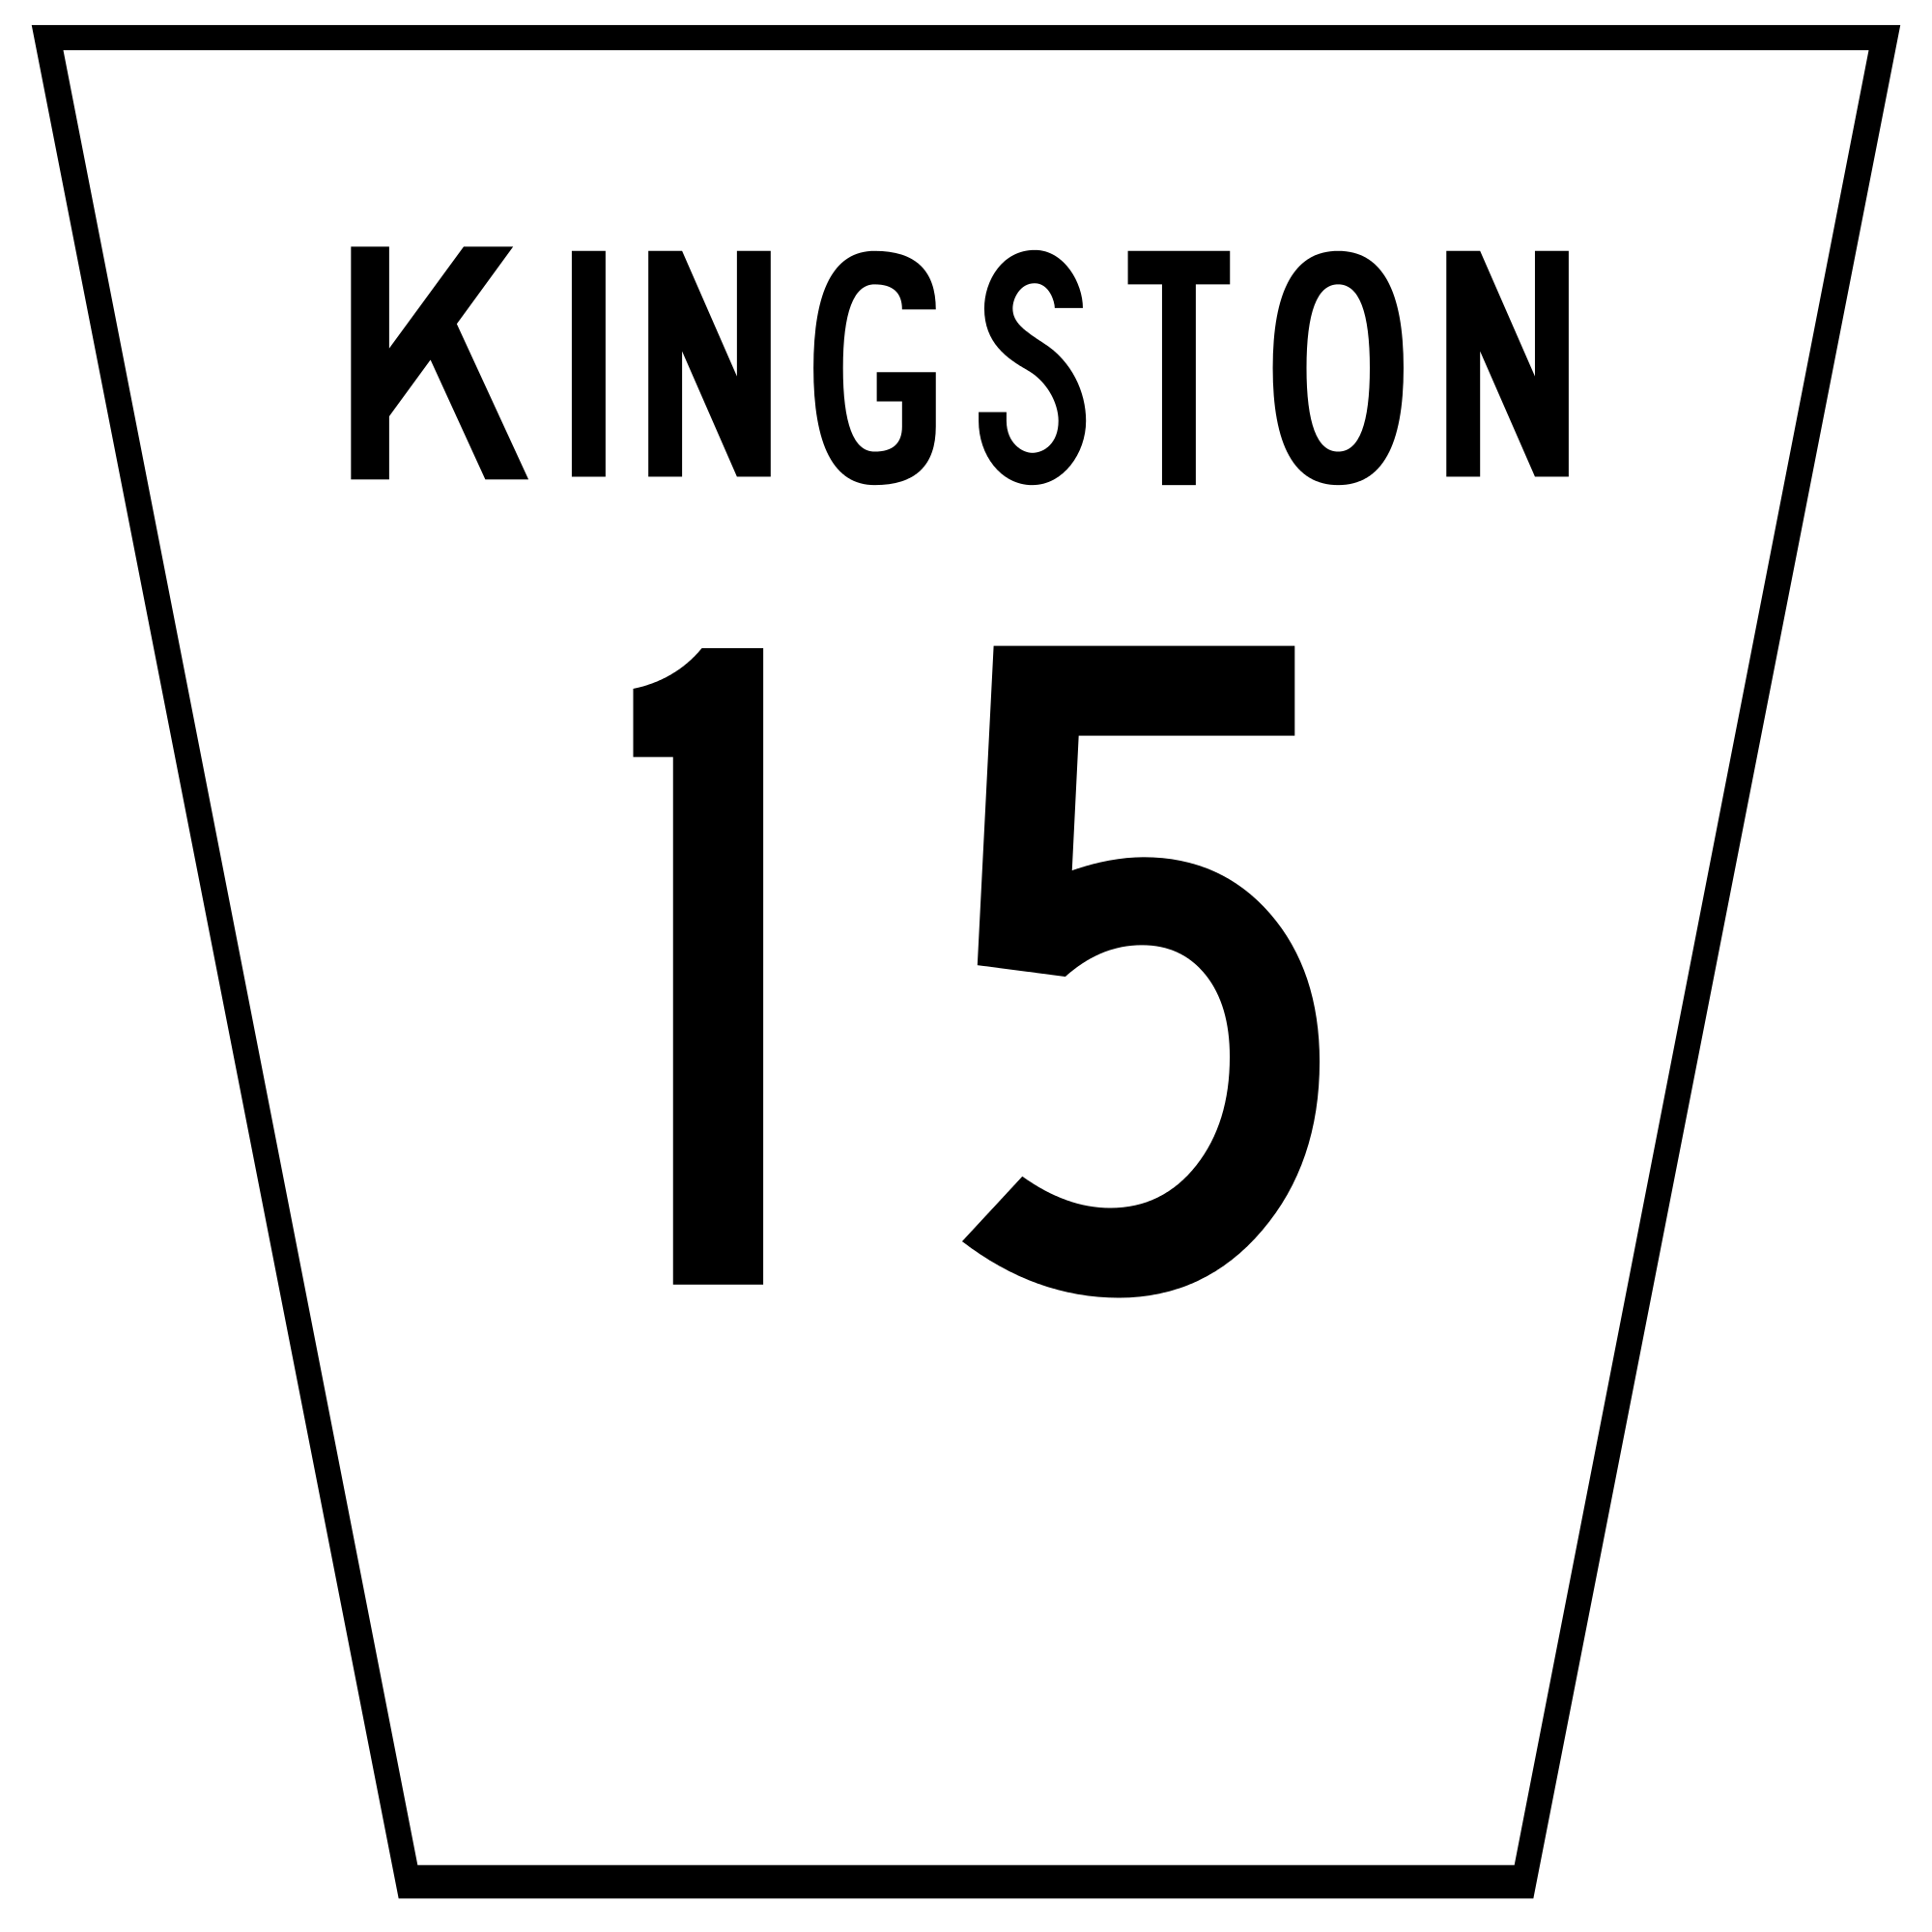 Clipart road city road. File kingston svg wikimedia